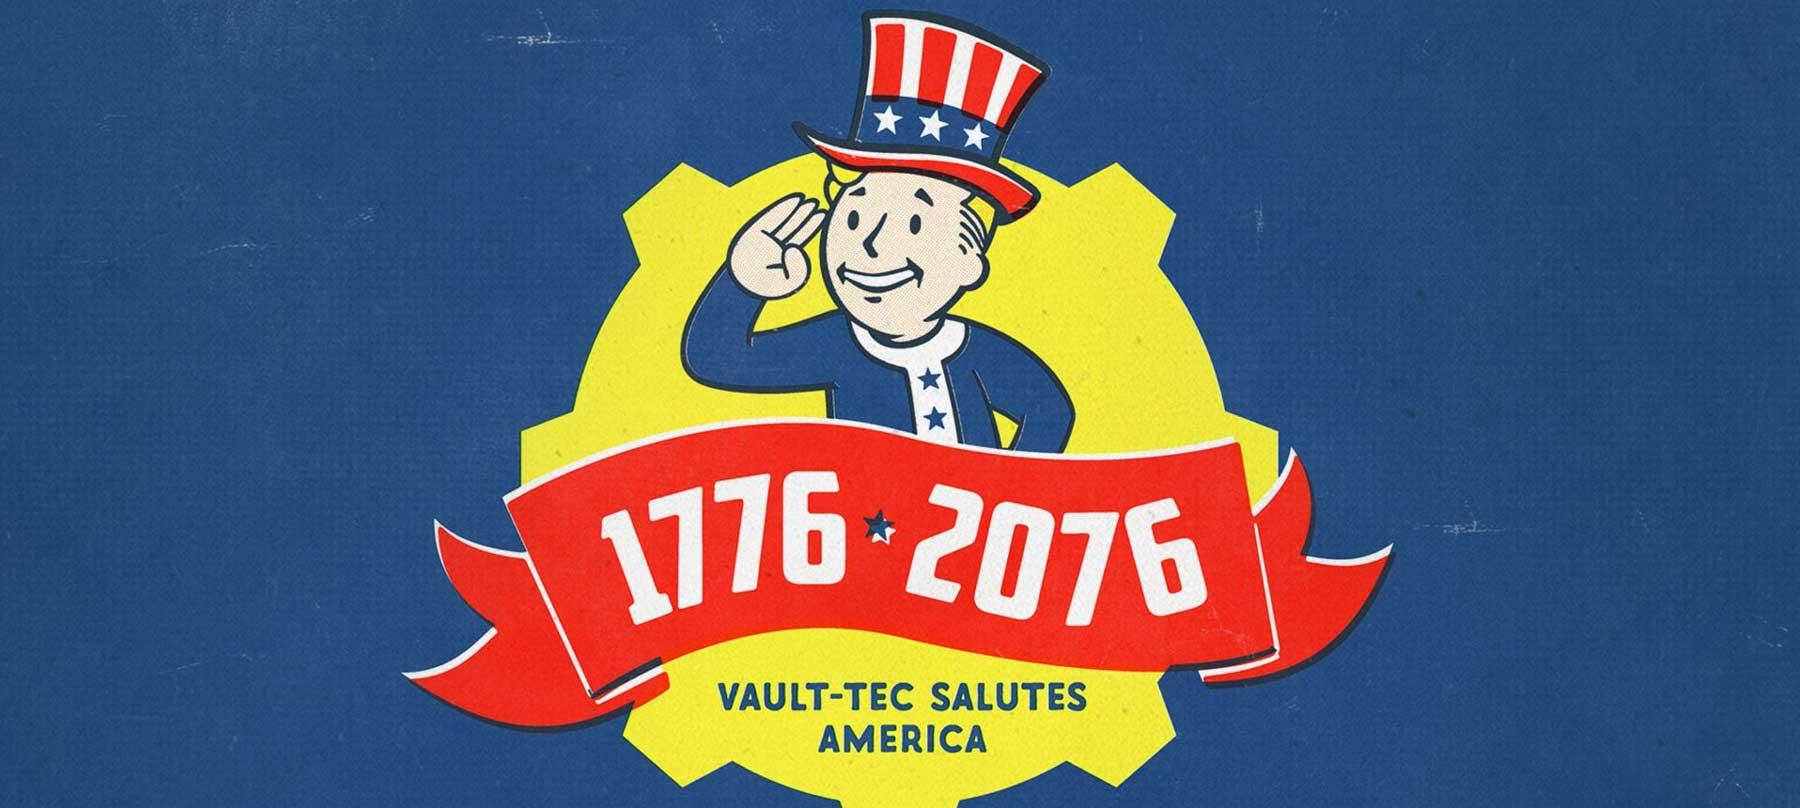 Fallout 76 - Image 1 f4c1c291326a